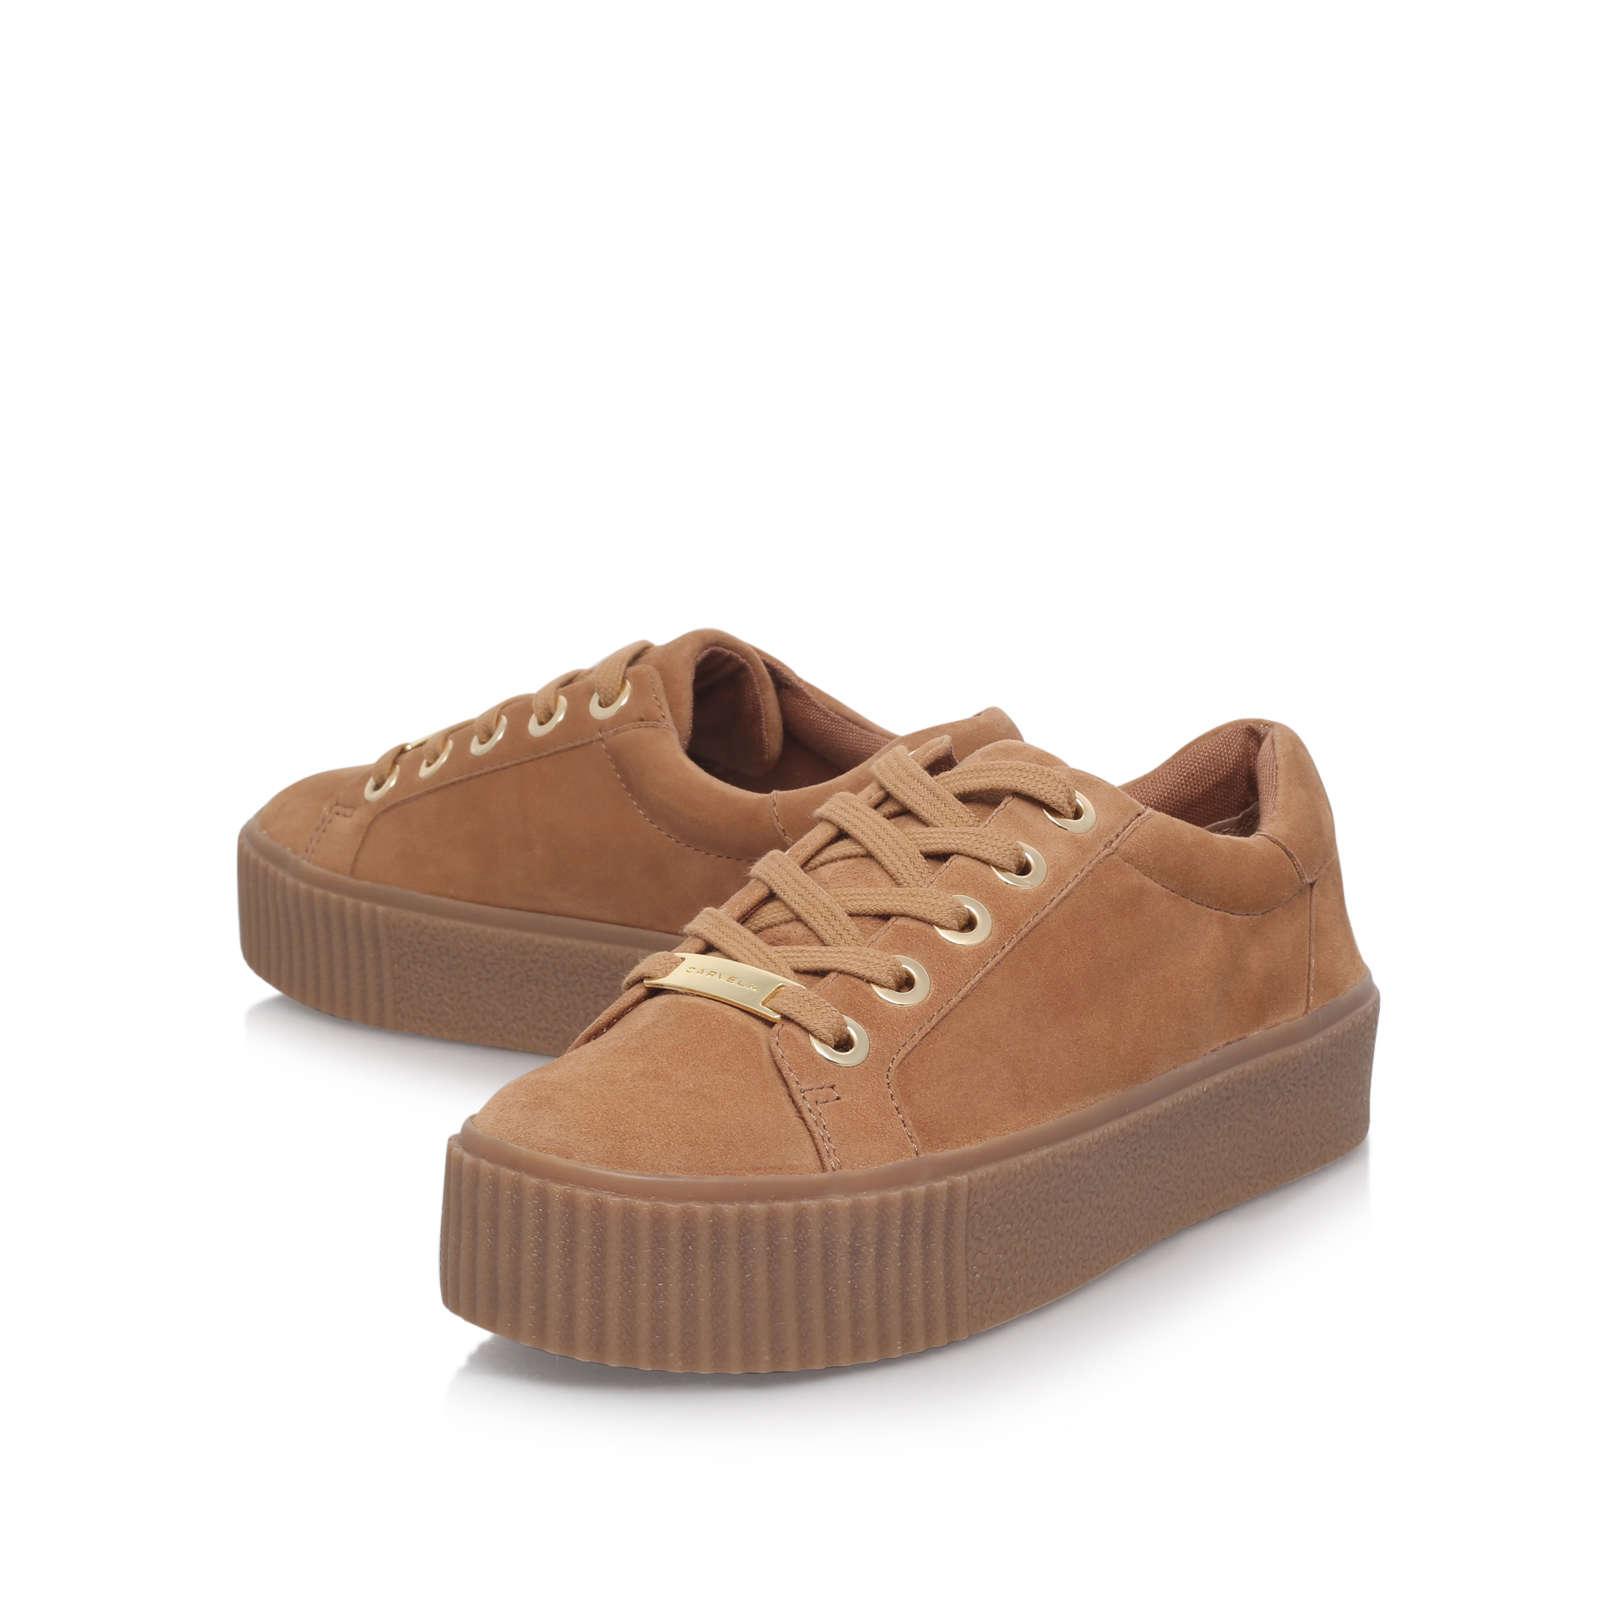 Carvela Girl Shoes